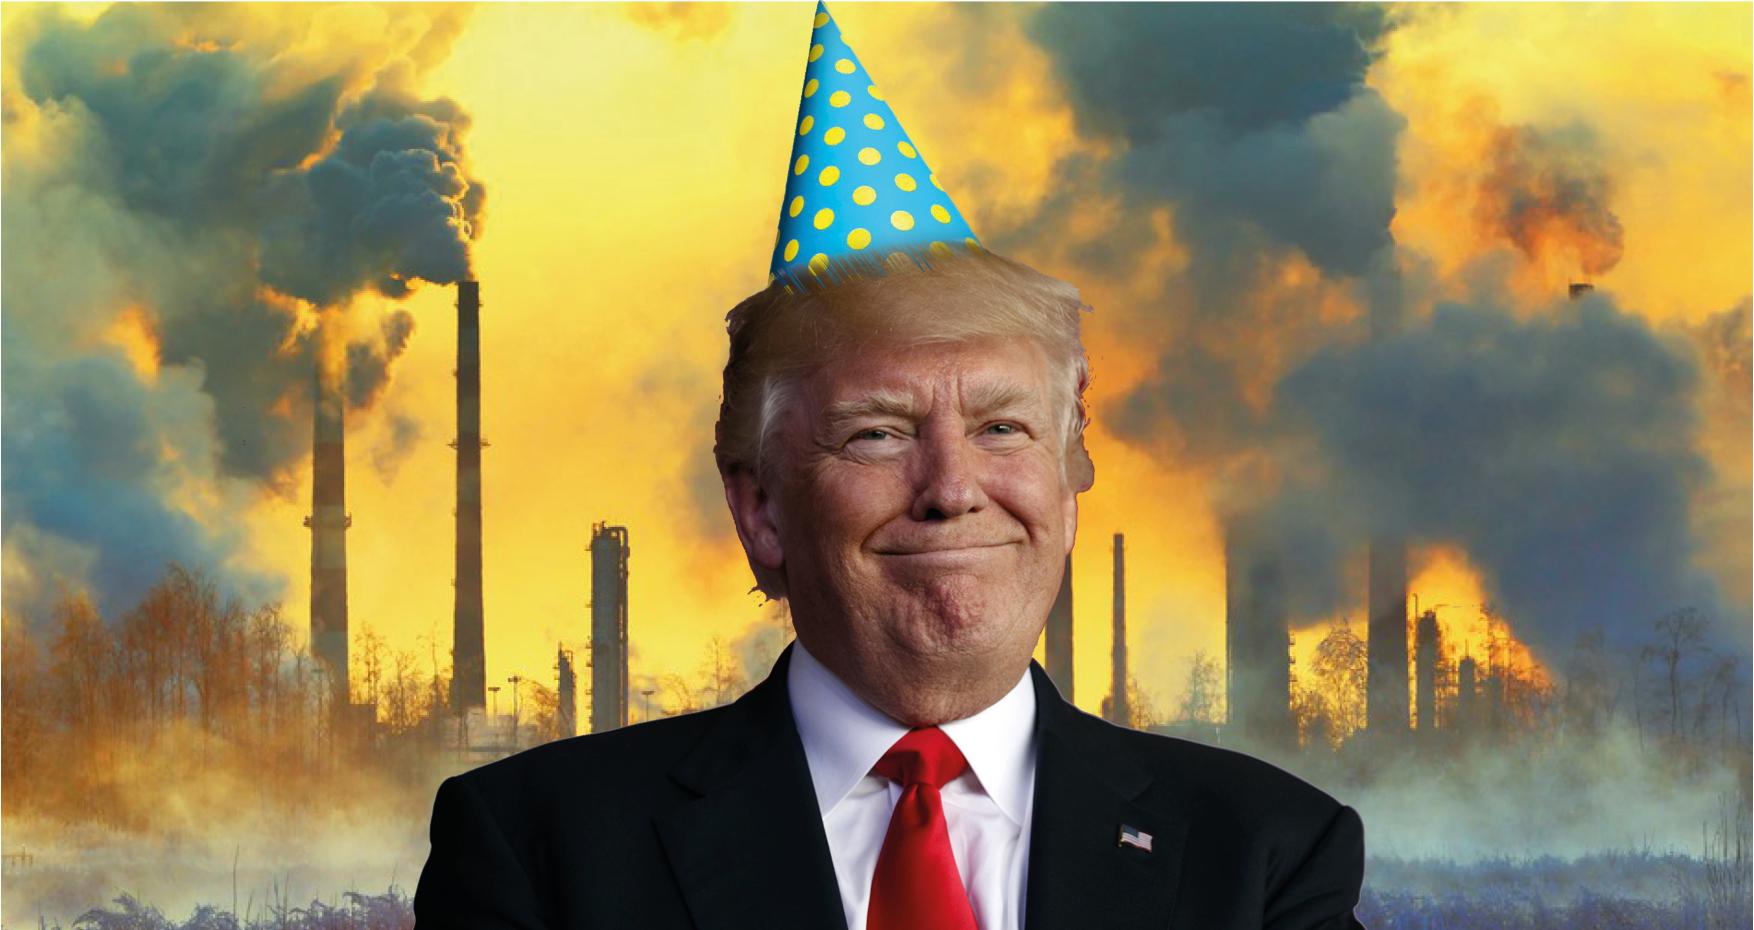 Trump earth day banner 4.jpg